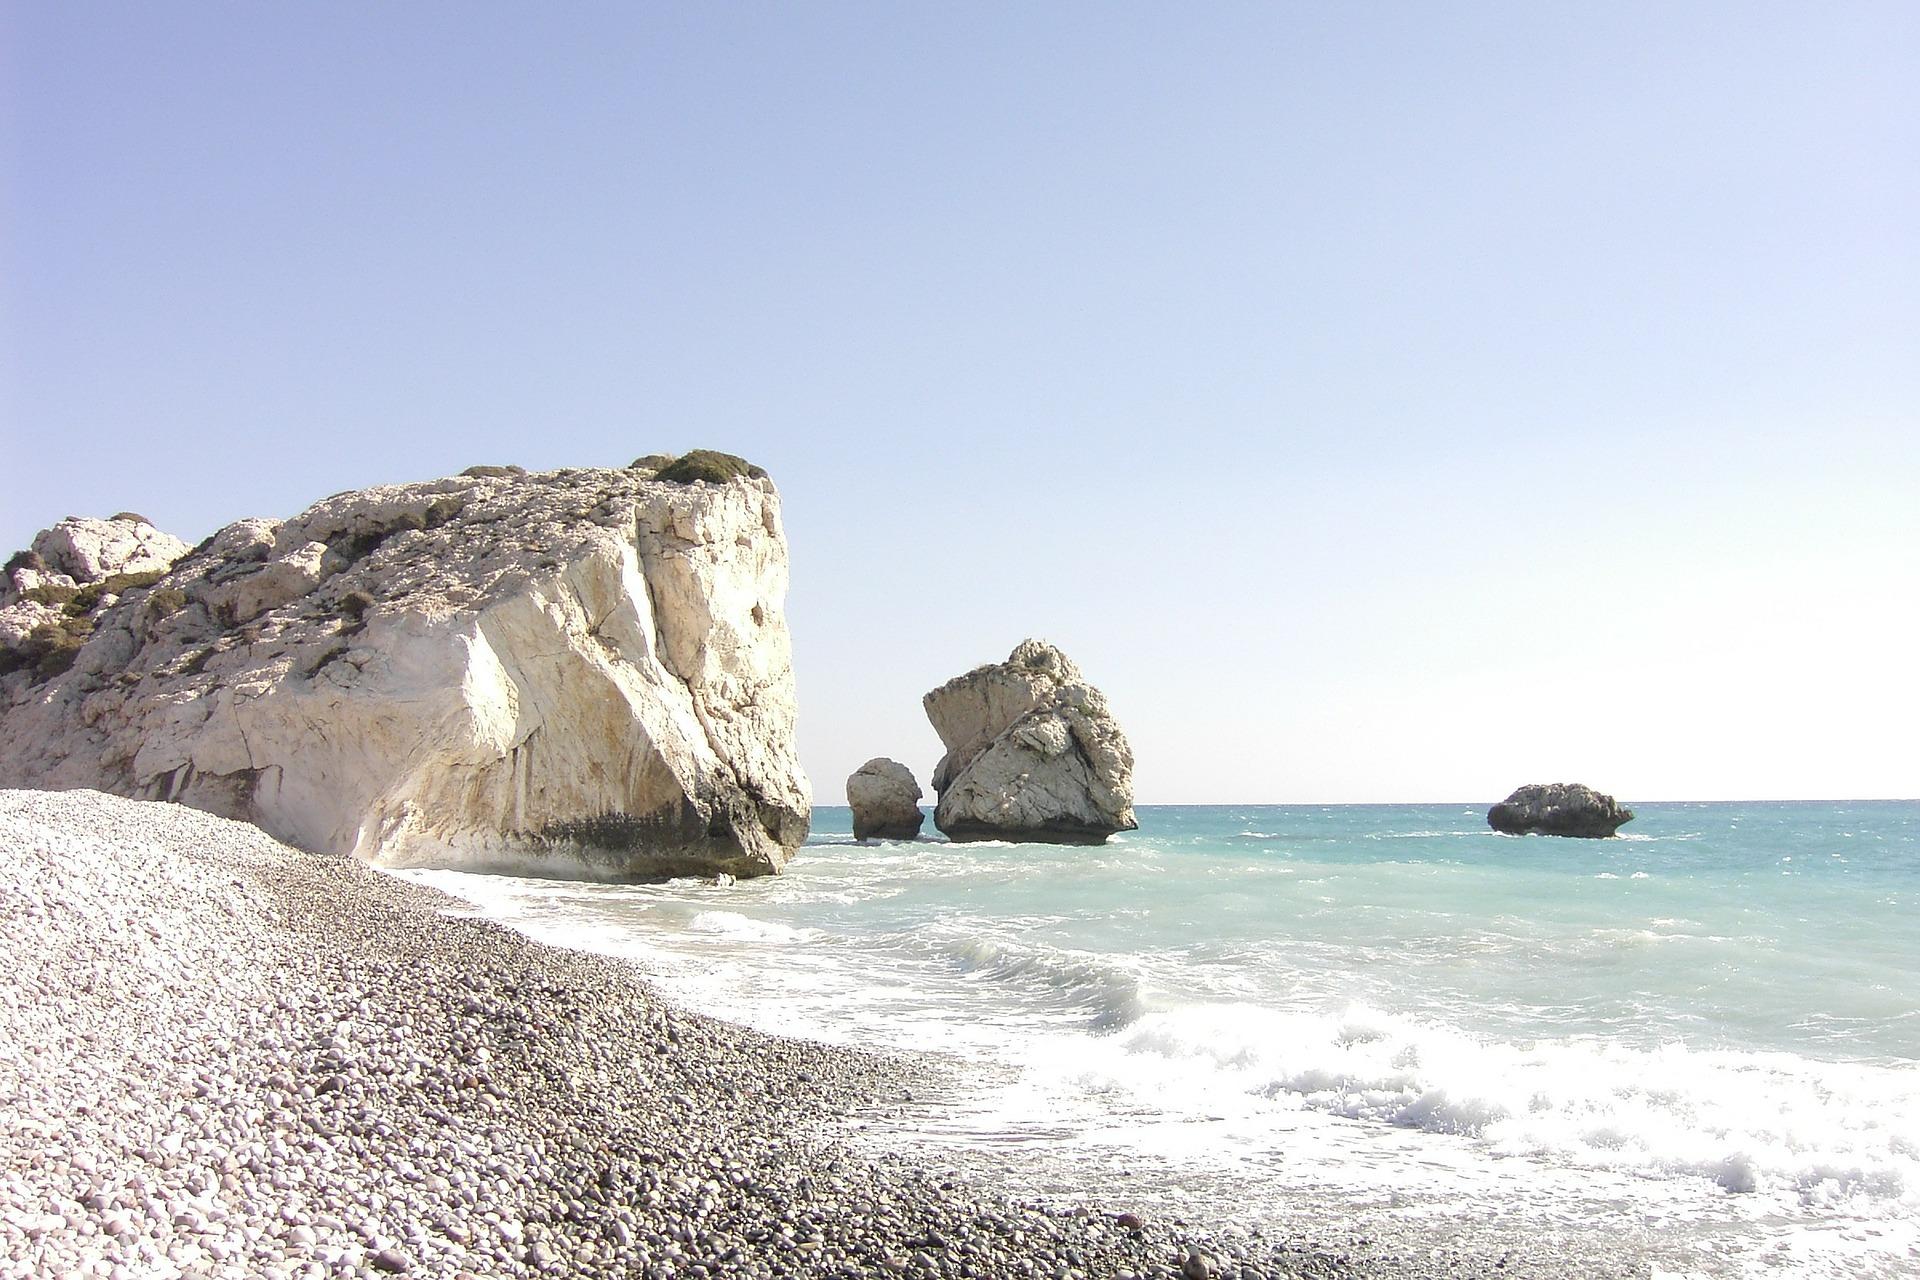 Sea Coast With Giant Boulders